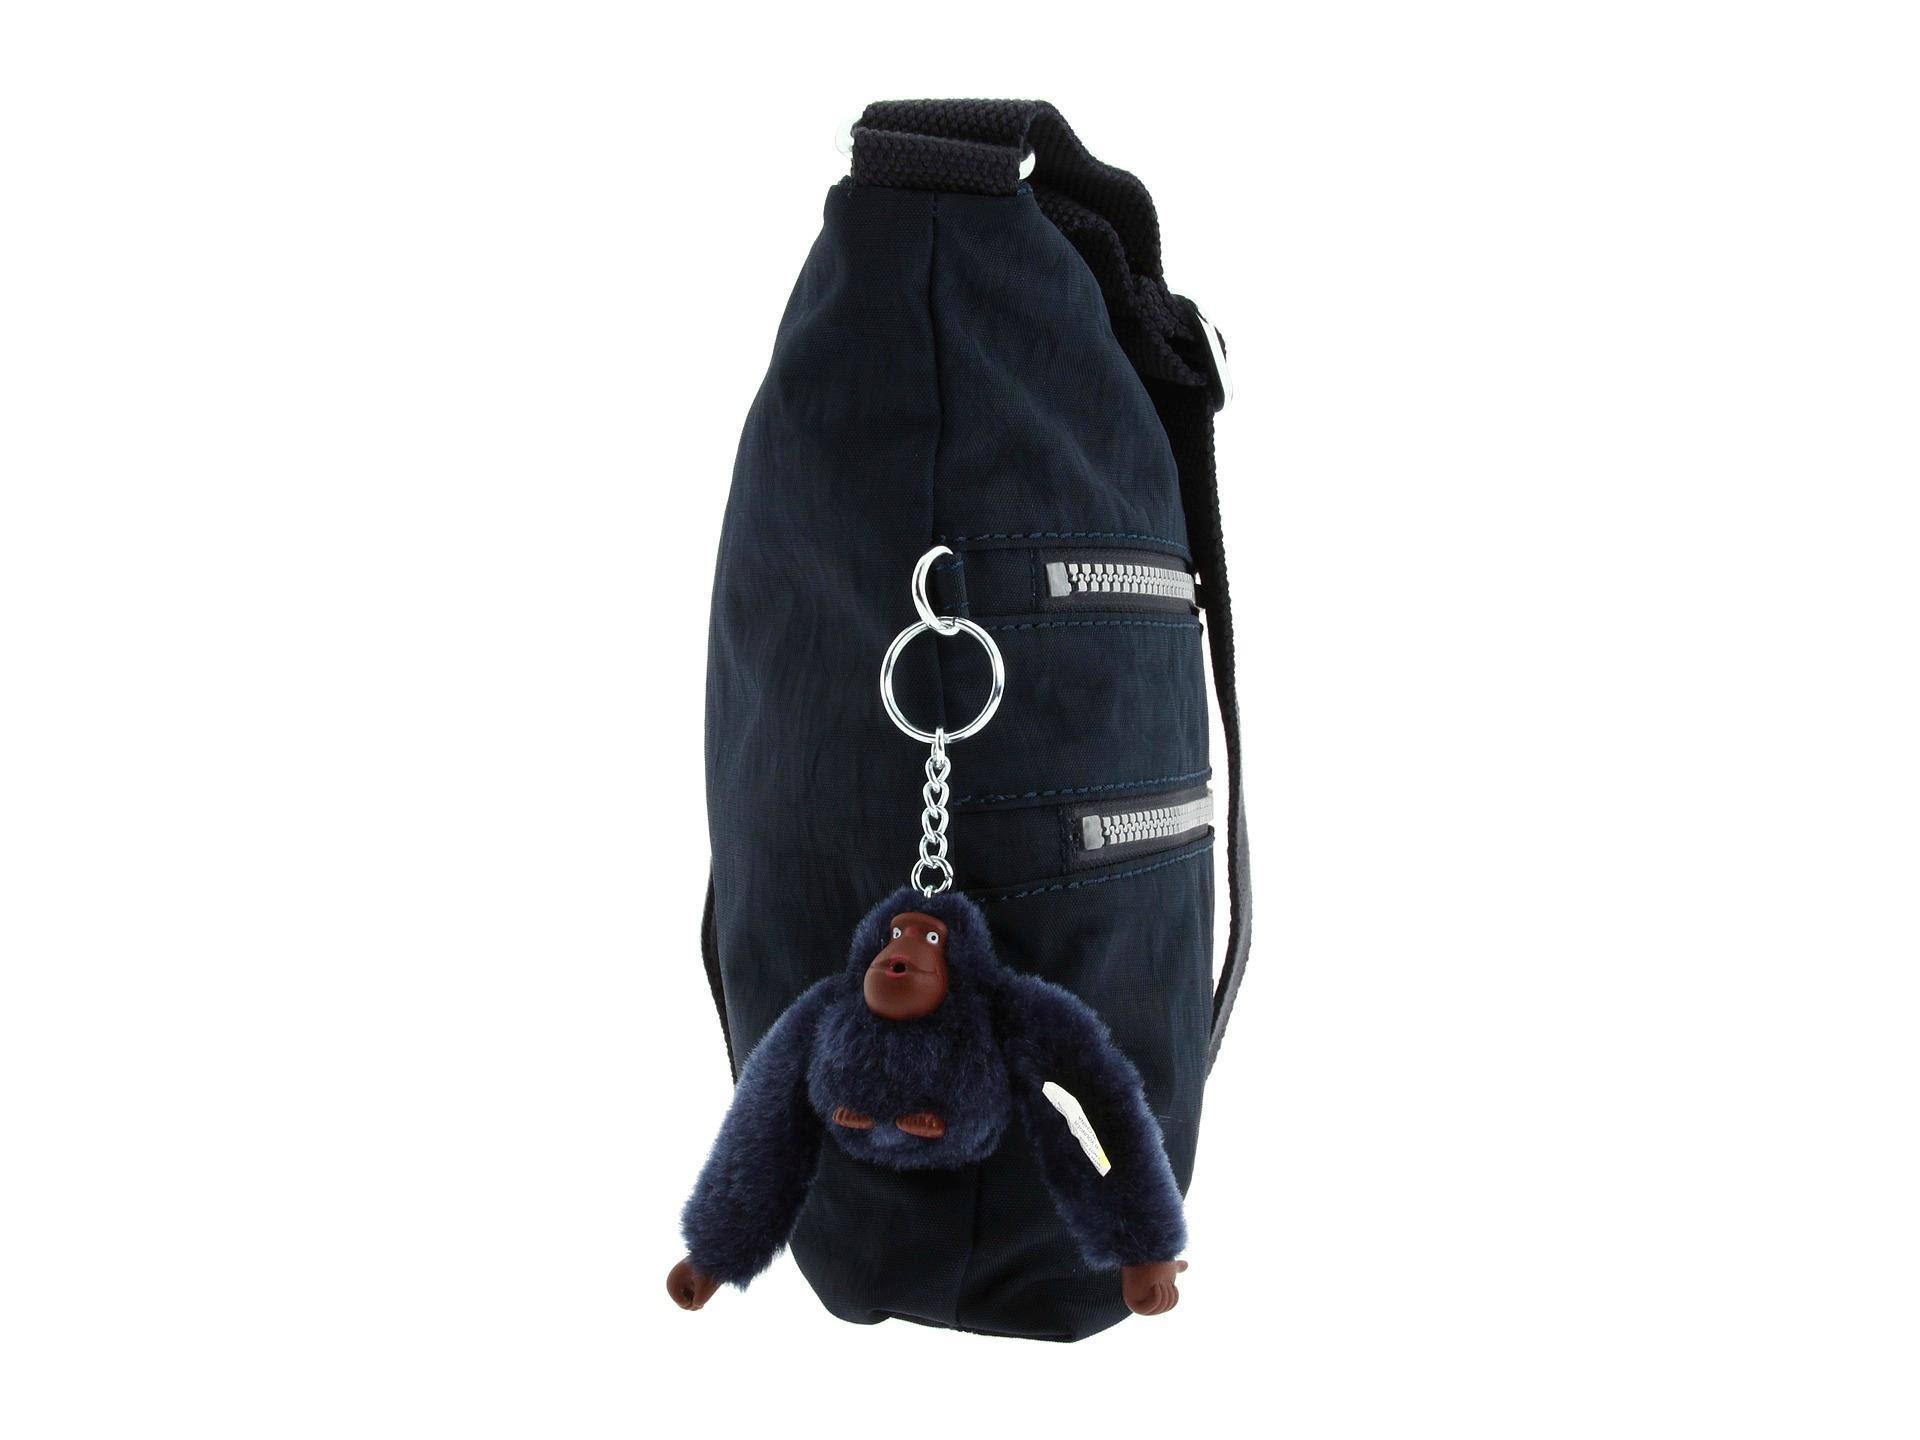 Bag donna da scuro Crossbody Kipling Grigio di Solid Alvar l1Ju3TKcF